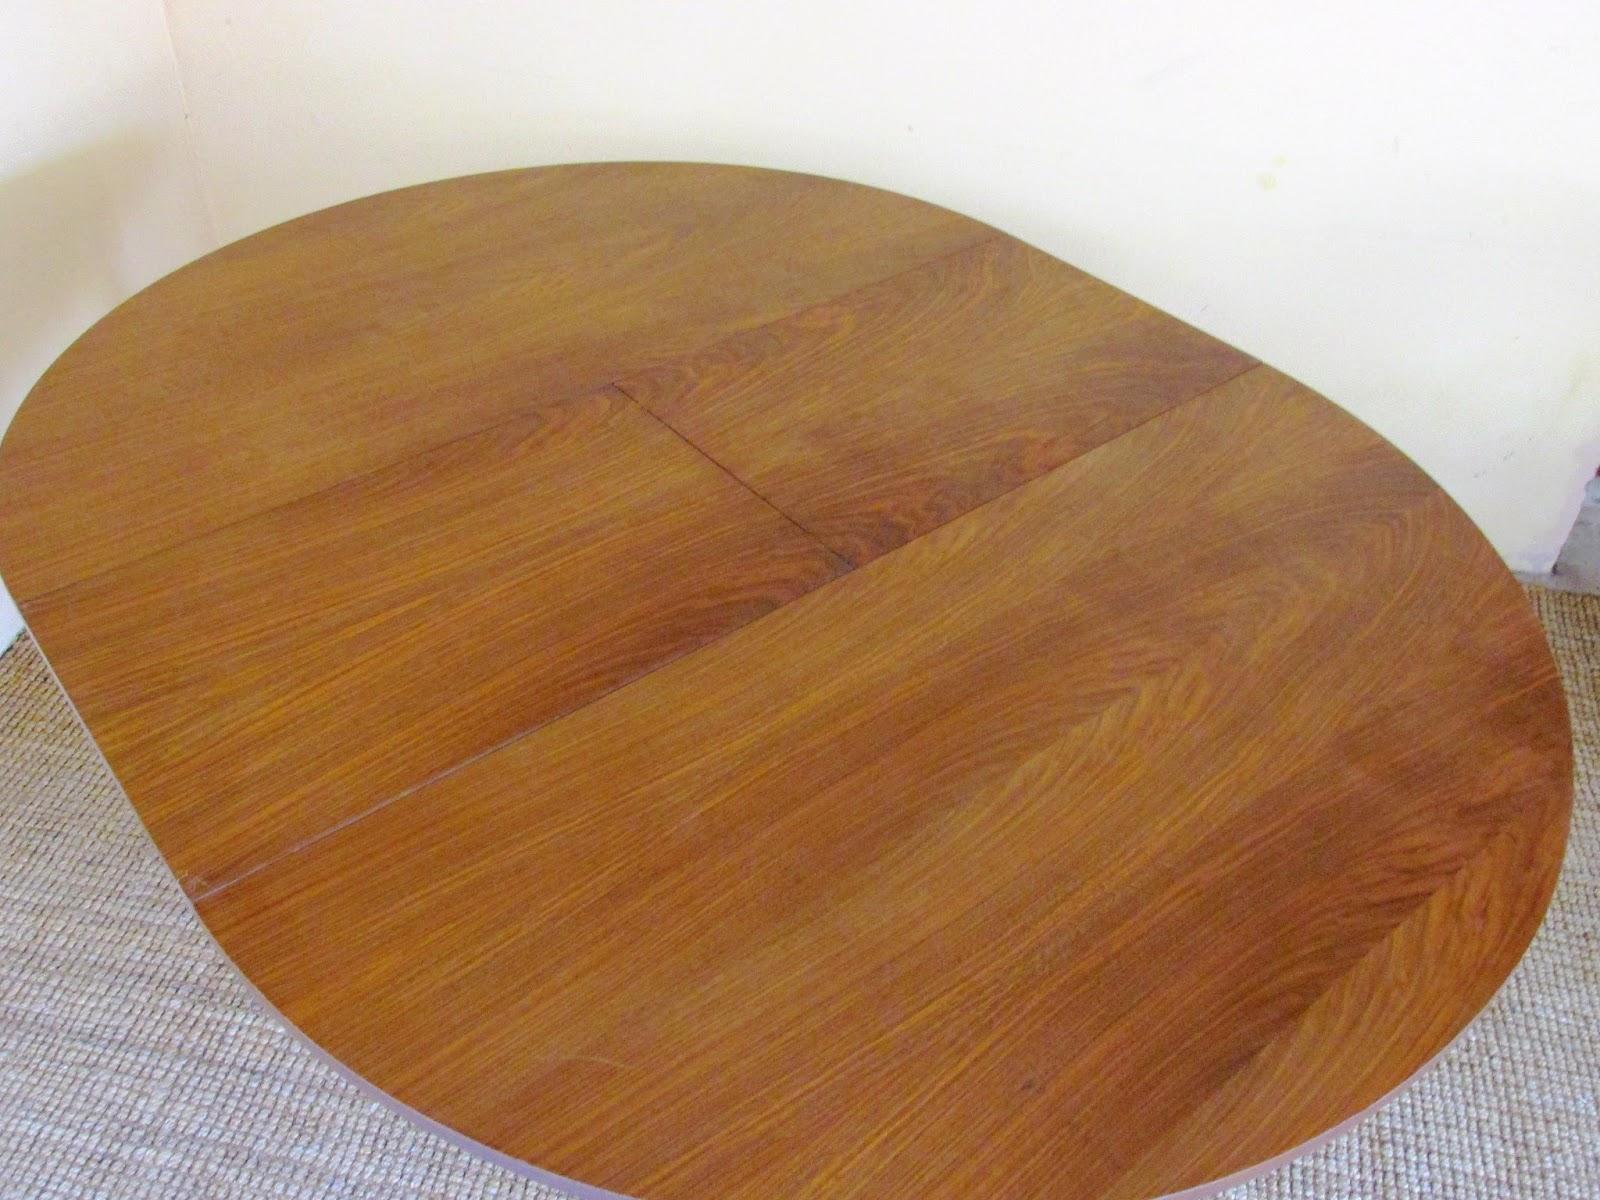 Colecci n siglo xx antig edades y dise o mesa redonda for Mesa redonda diseno madera